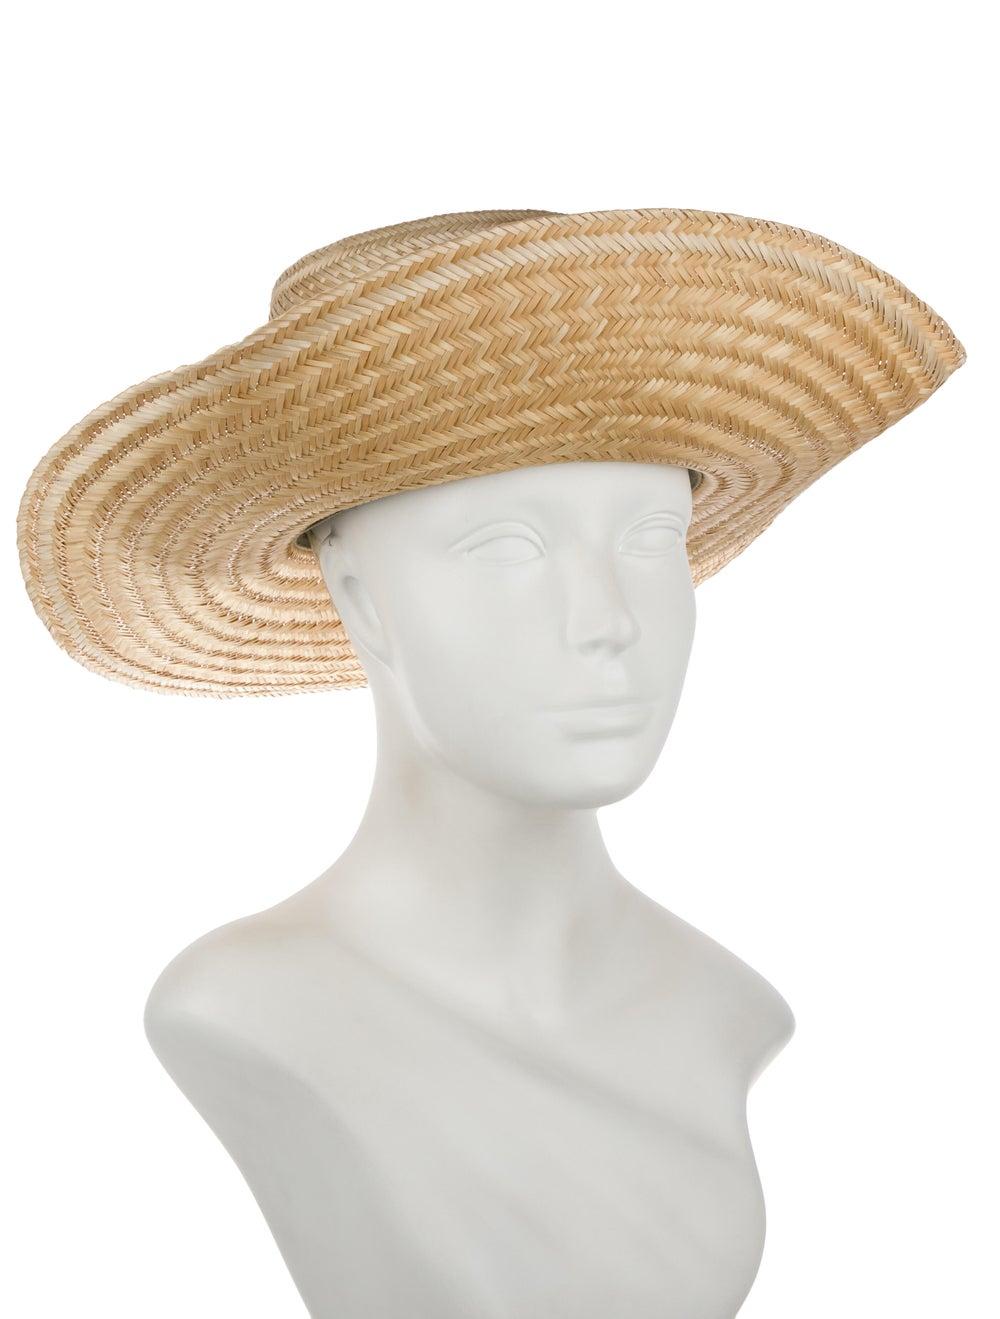 Janessa Leone Straw Hat Tan - image 3